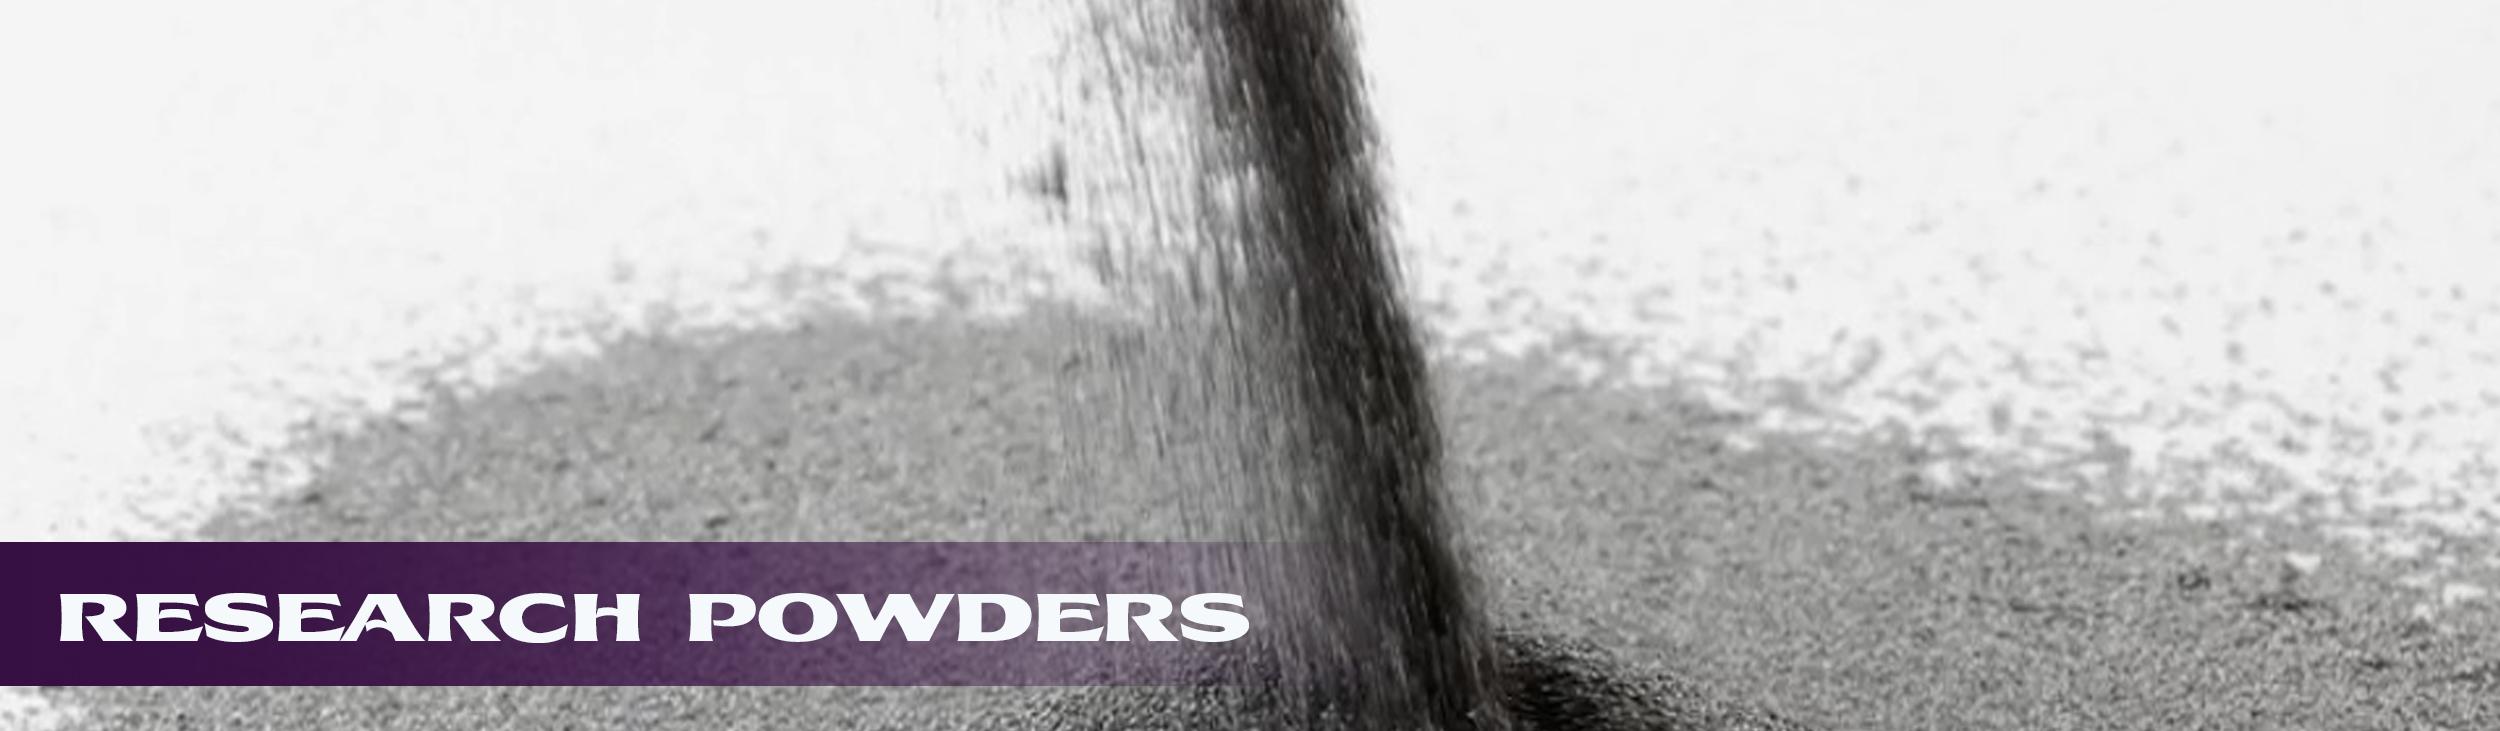 research powders